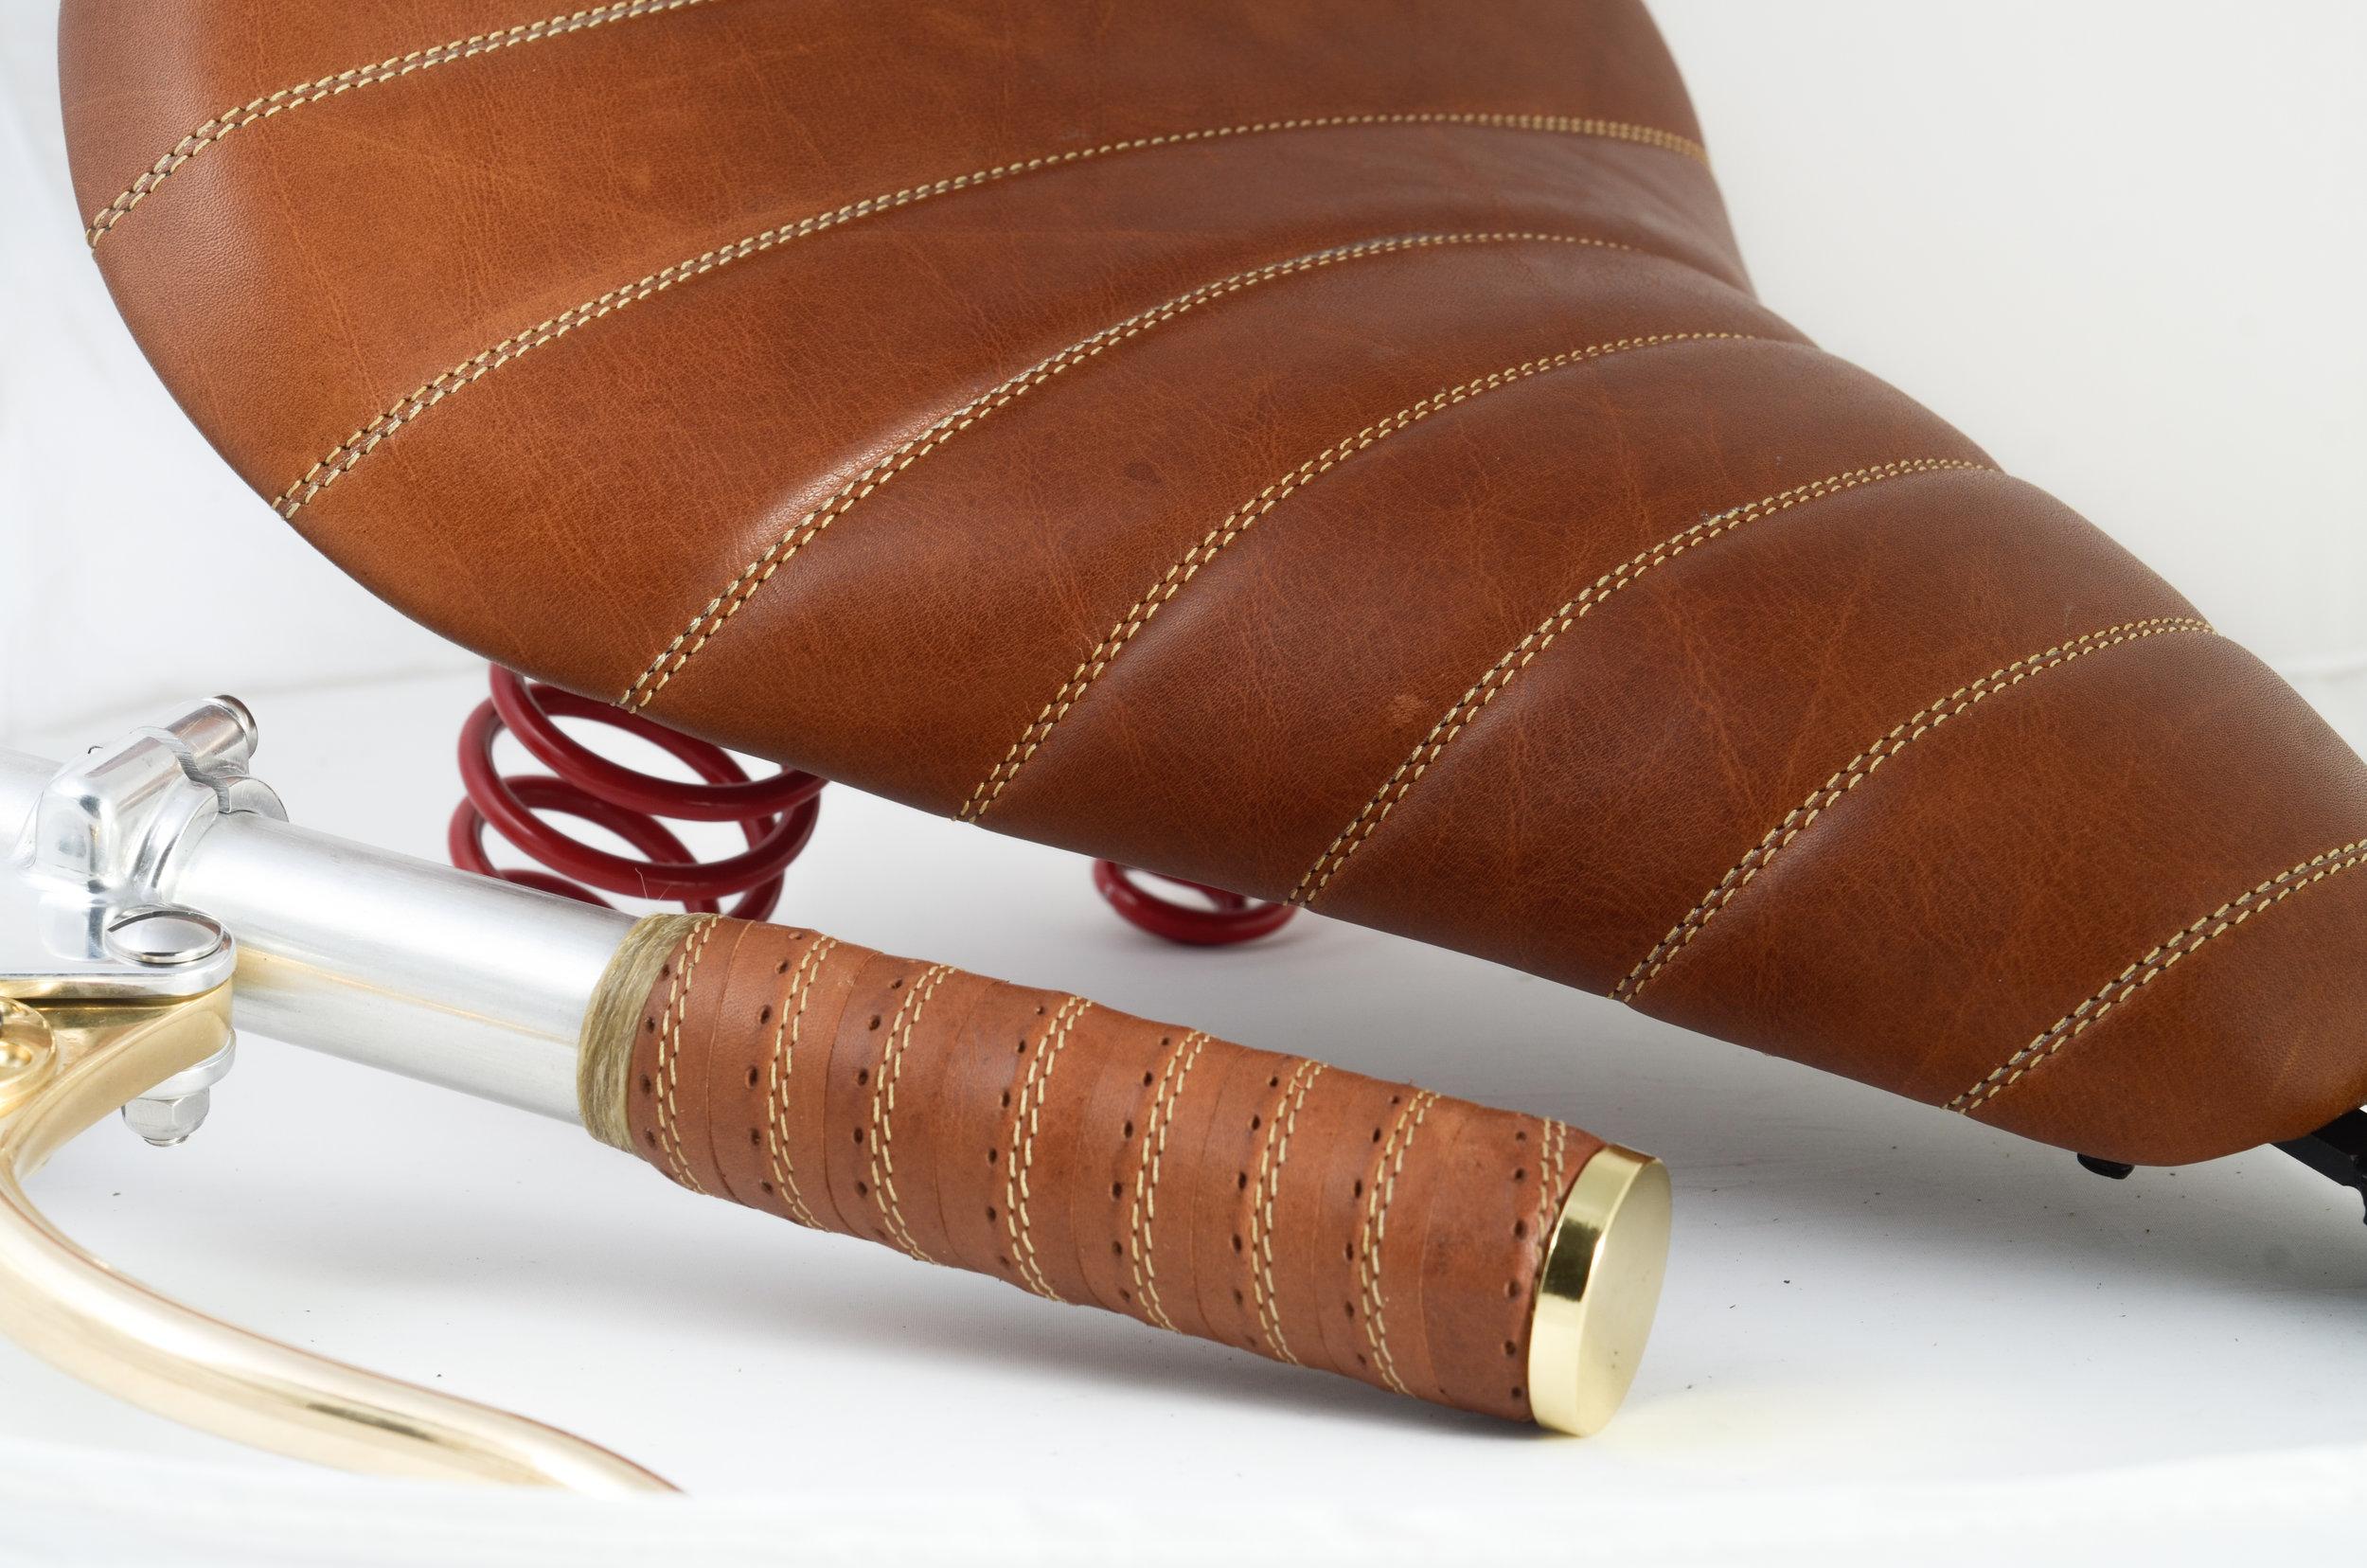 Bobber kit chestnut-custom leather motorcycle seat and grips-4.jpg